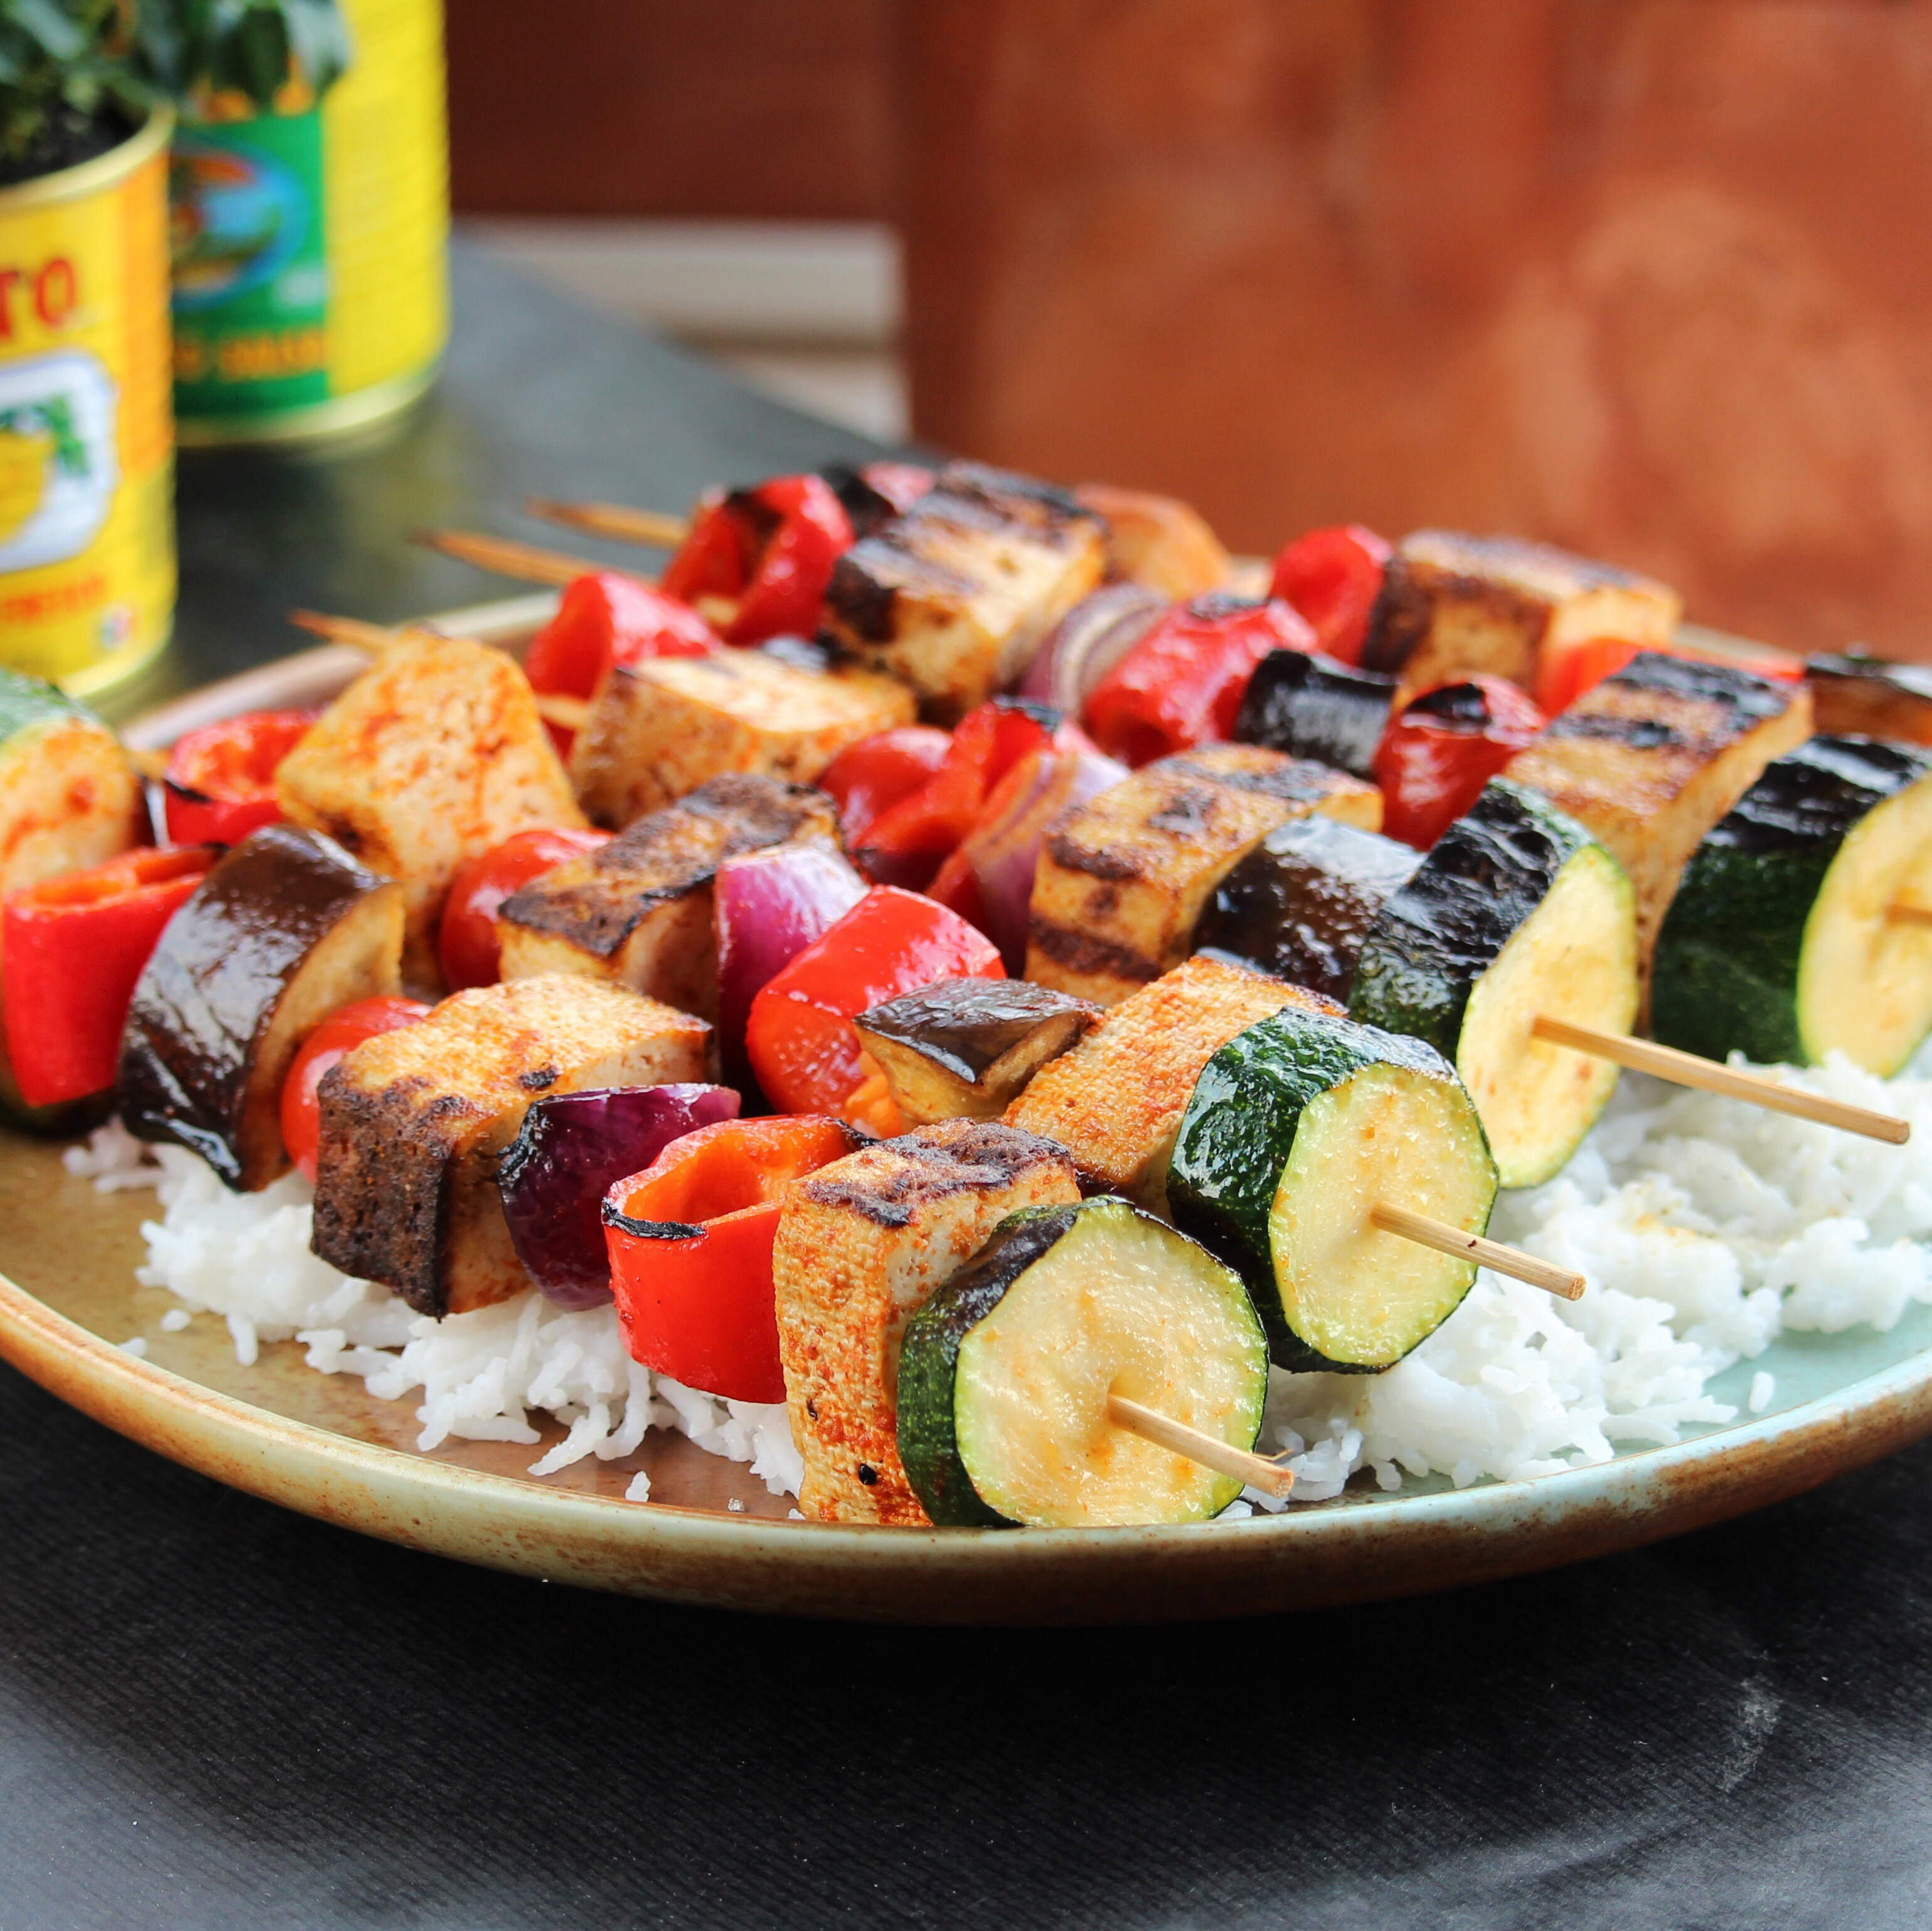 Grilled Tofu Skewers with Sriracha Sauce